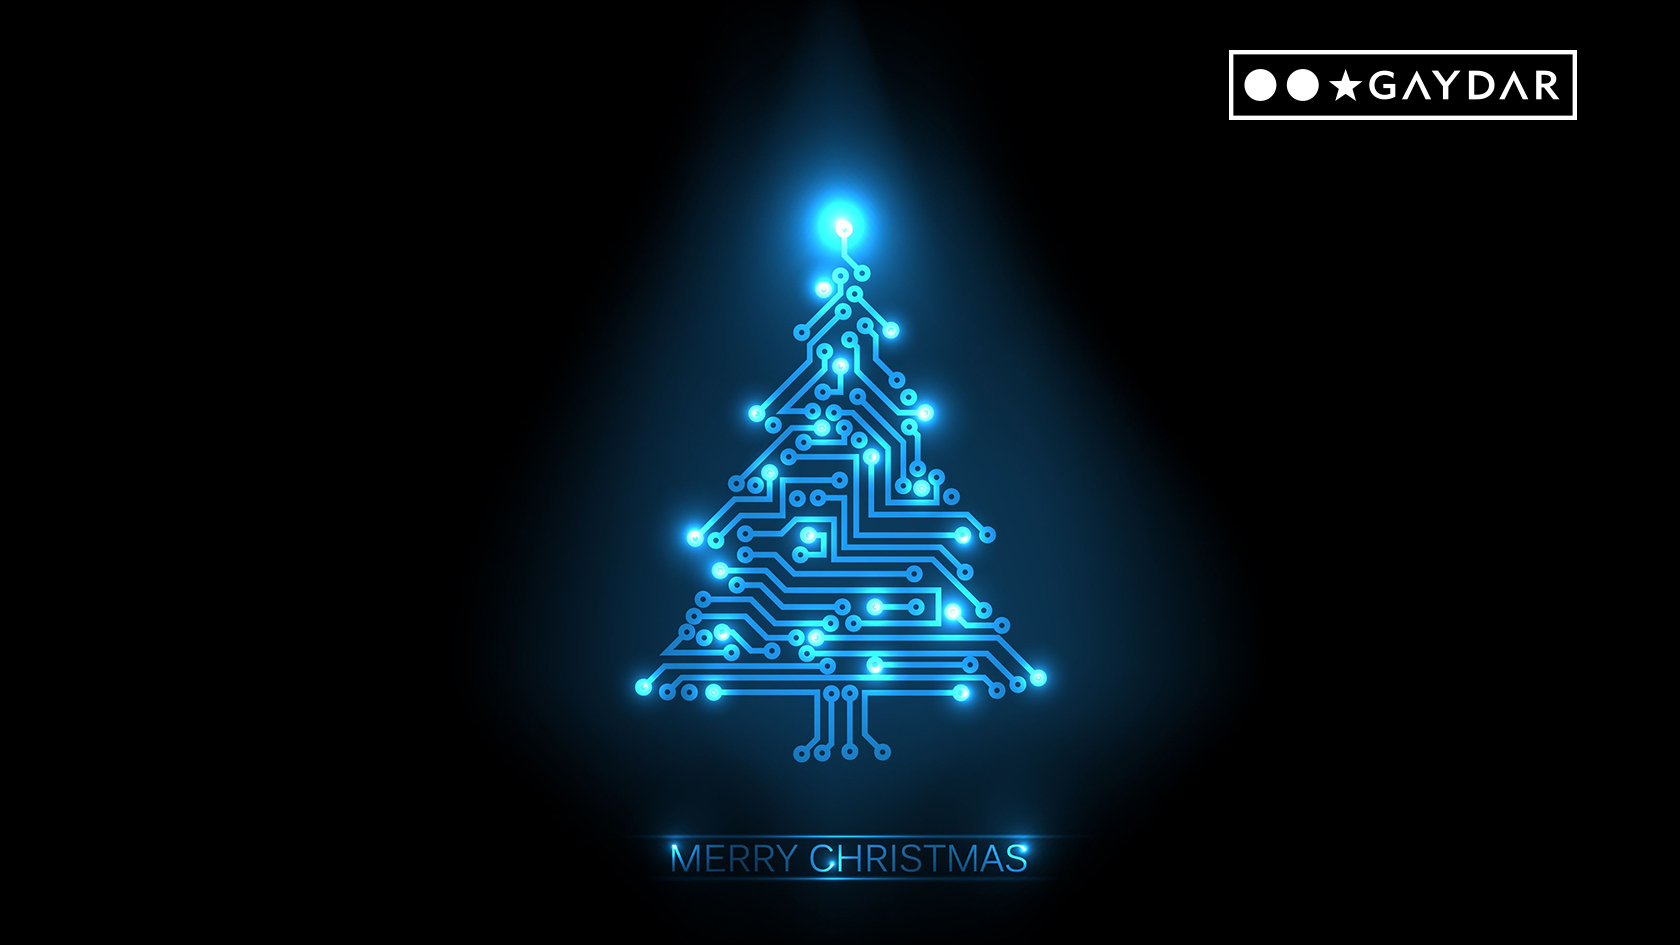 Gaydar Christmas 2018